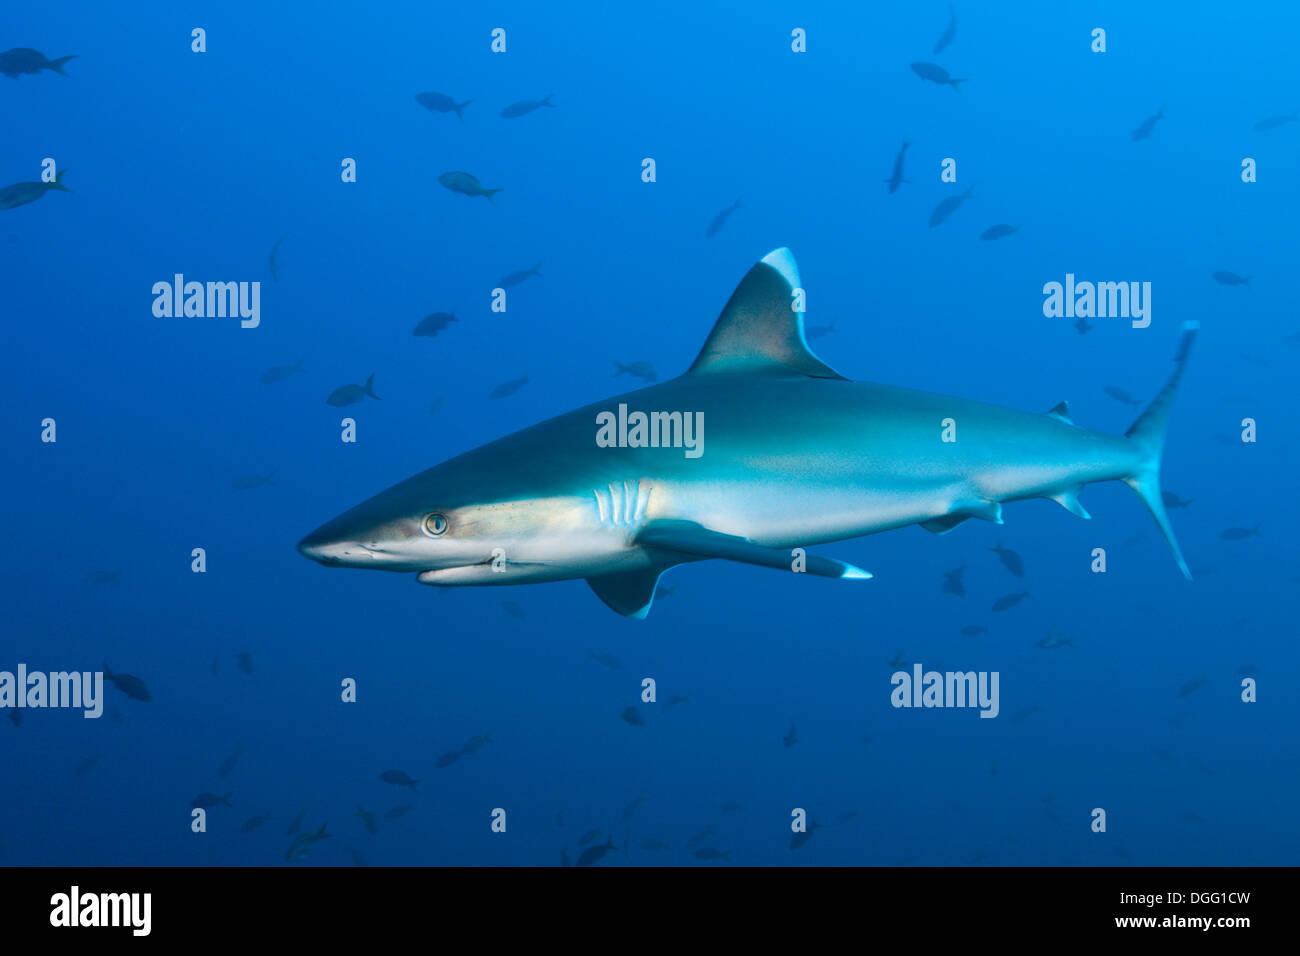 Silvertip Shark, Carcharhinus albimarginatus, Roca Partida, Revillagigedo Islands, Mexico - Stock Image